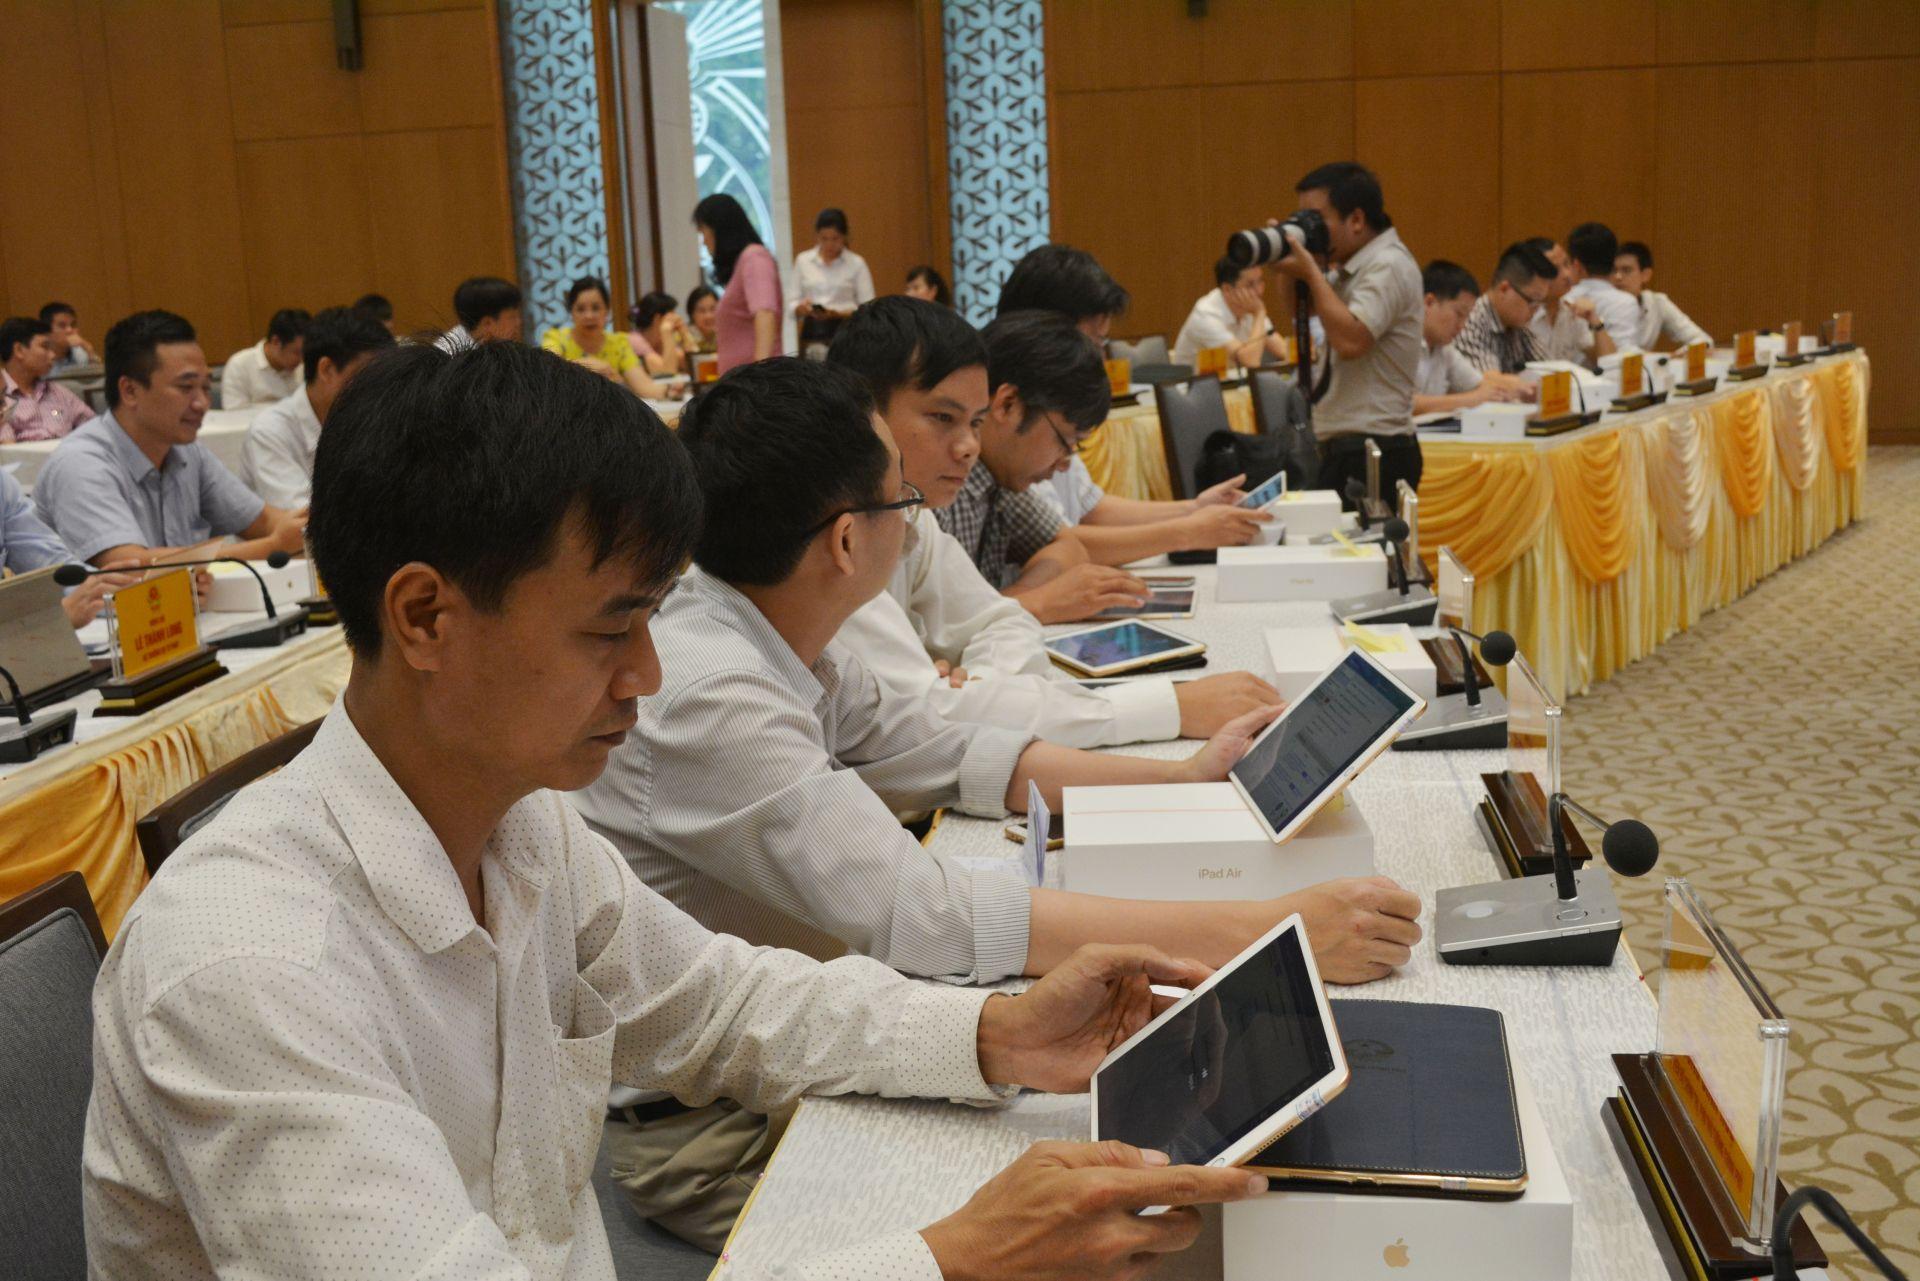 Description: http://baochinhphu.vn/Uploaded/dangdinhnam/2019_06_22/Tap%20huan%203.jpg